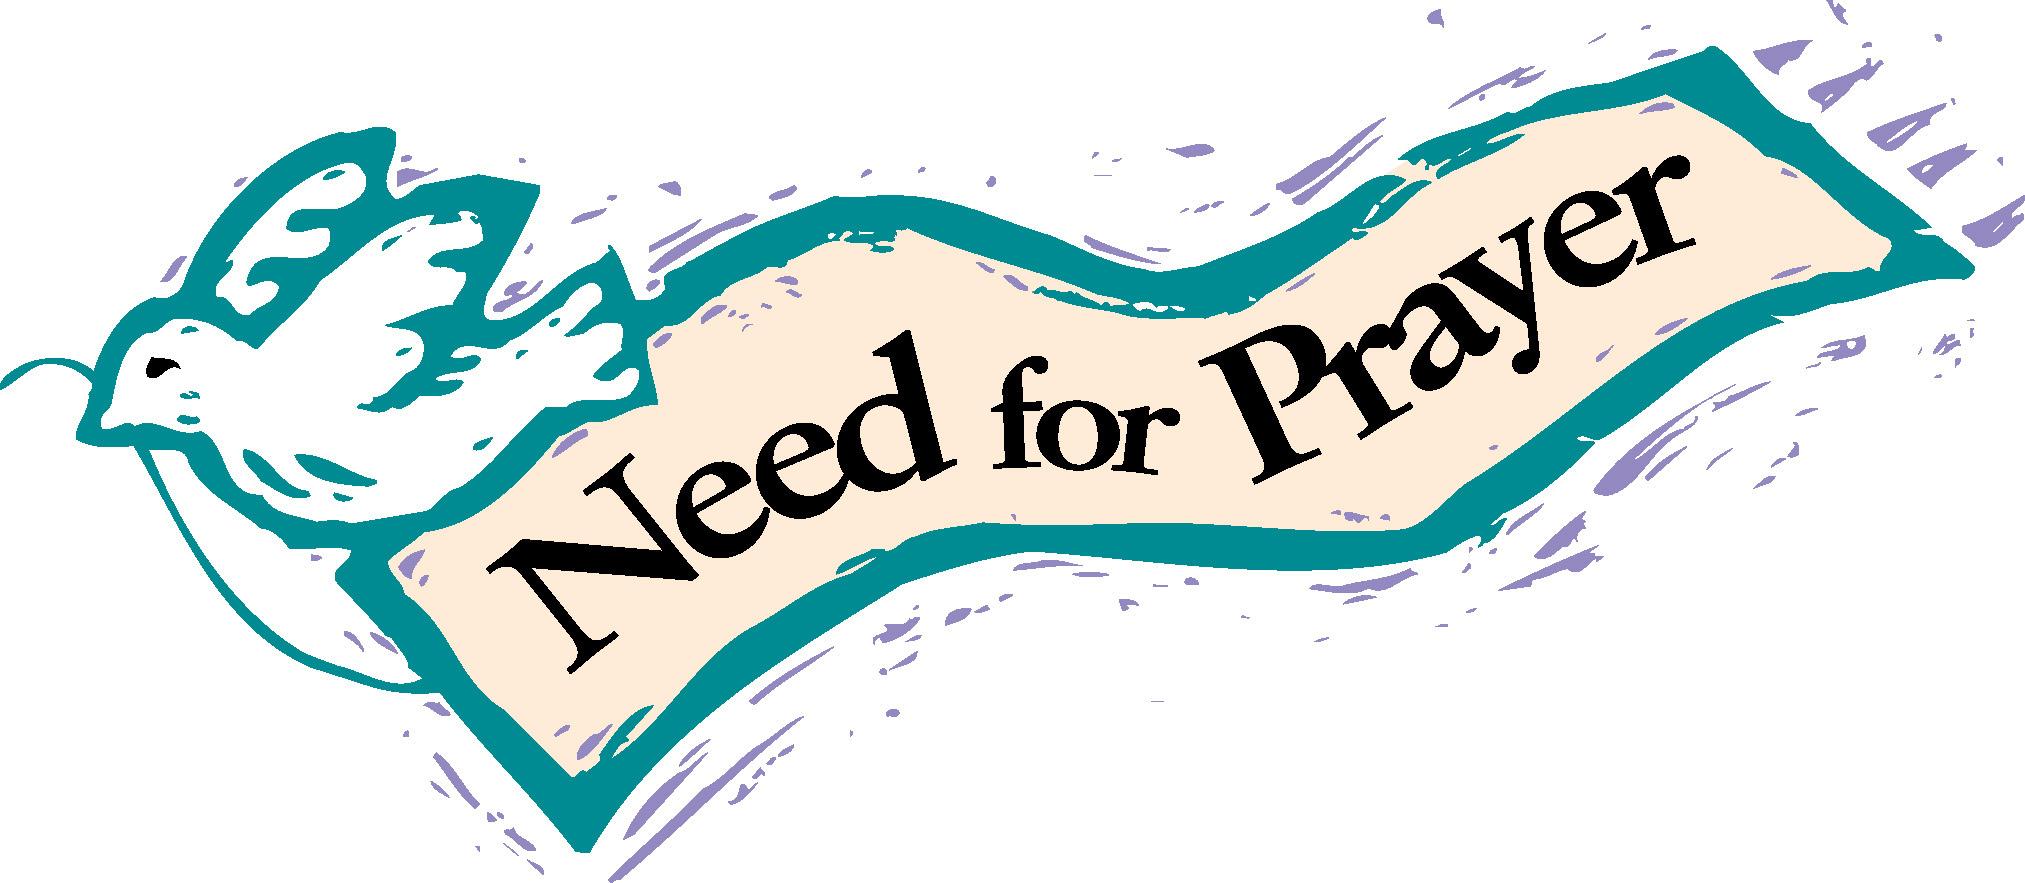 Prayer list clipart 3 » Clipart Station.